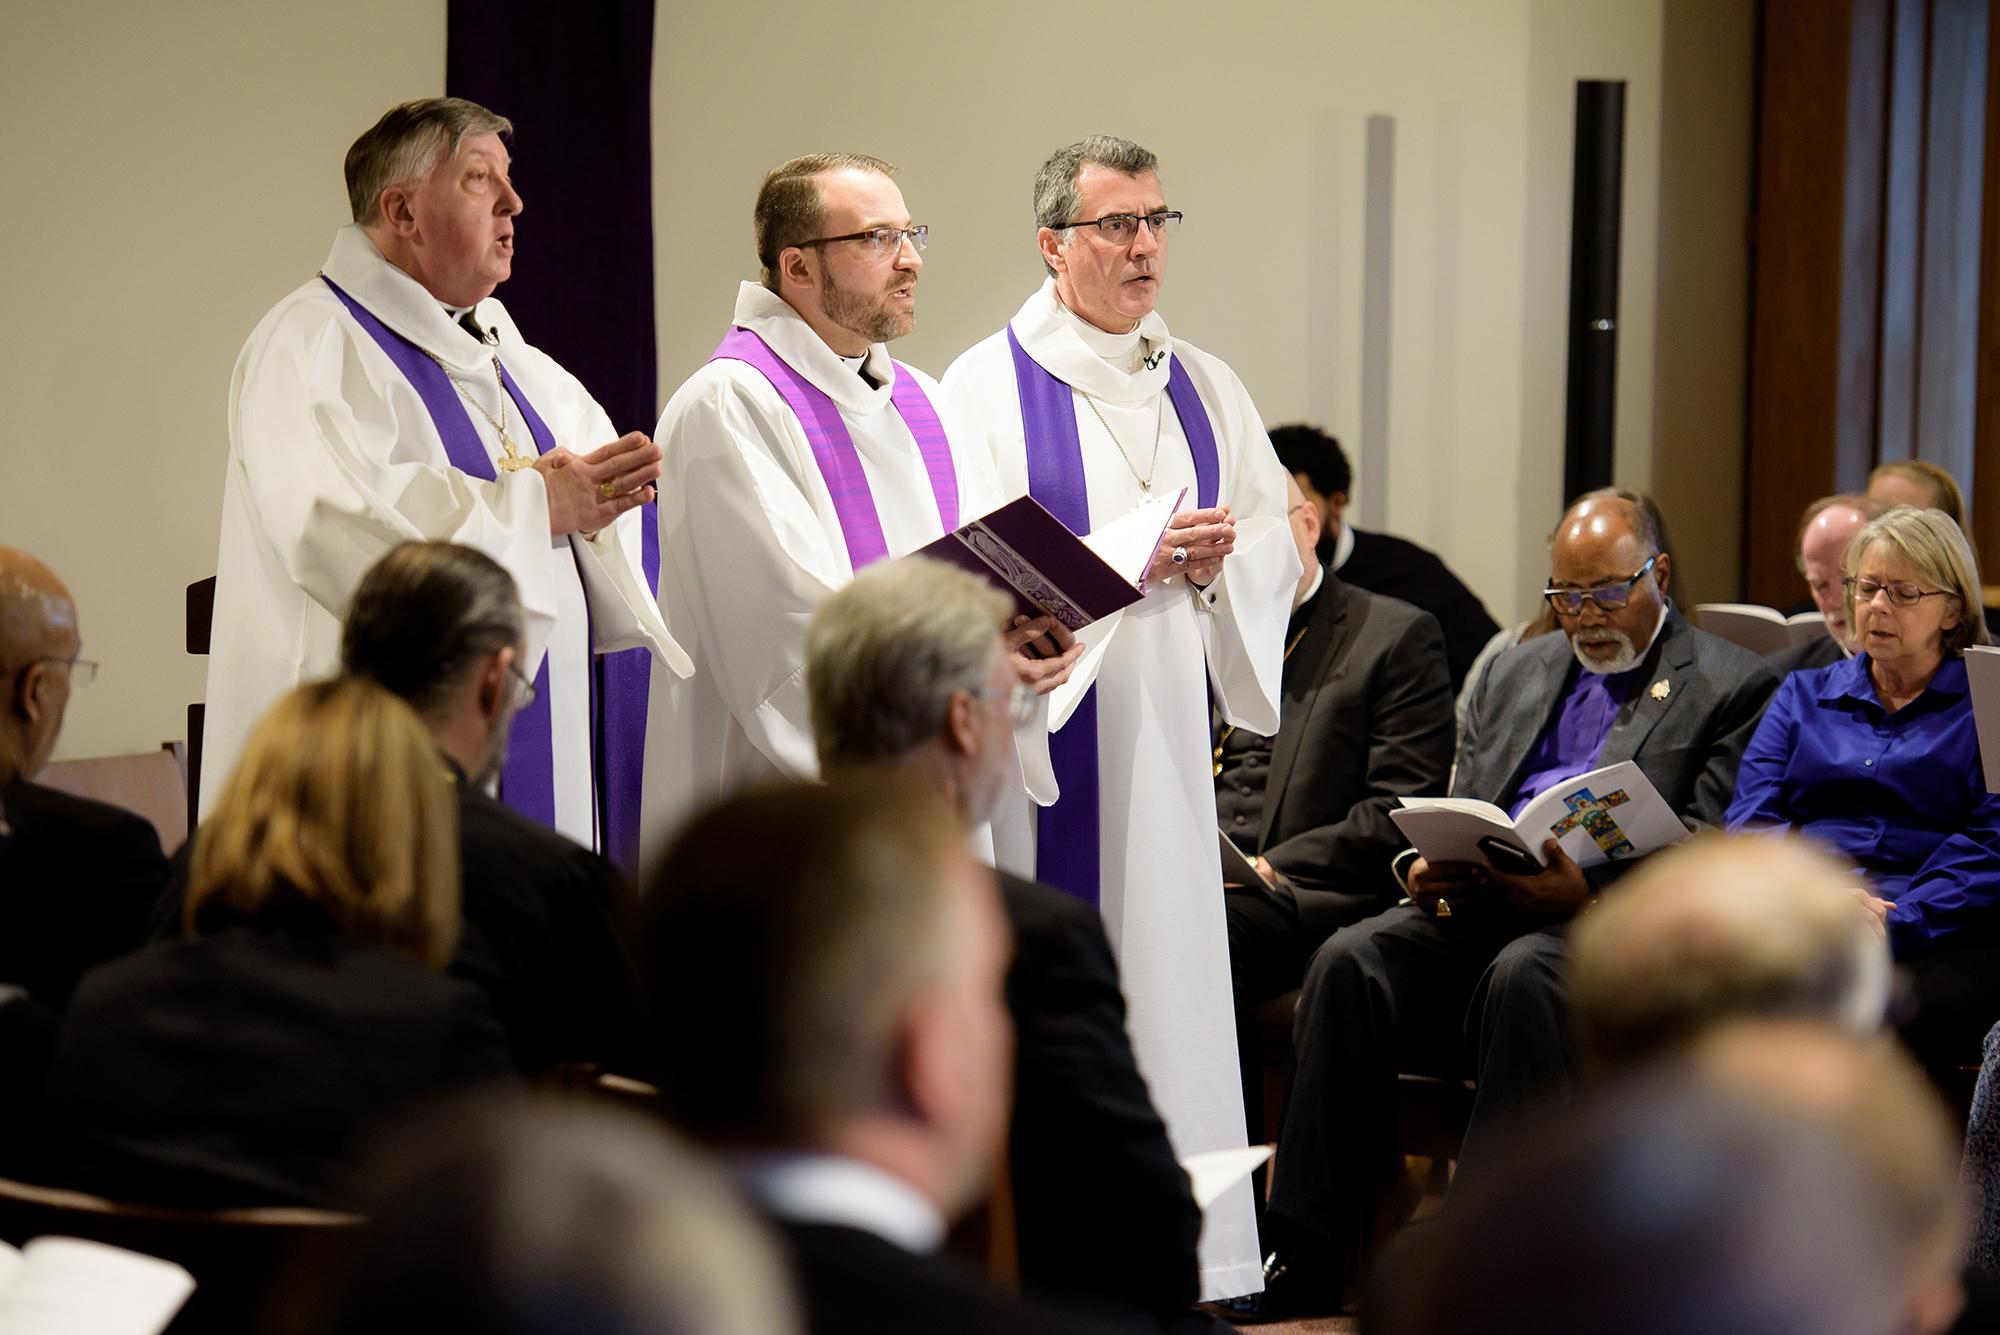 Lutheran-Catholic Service of Common Prayer